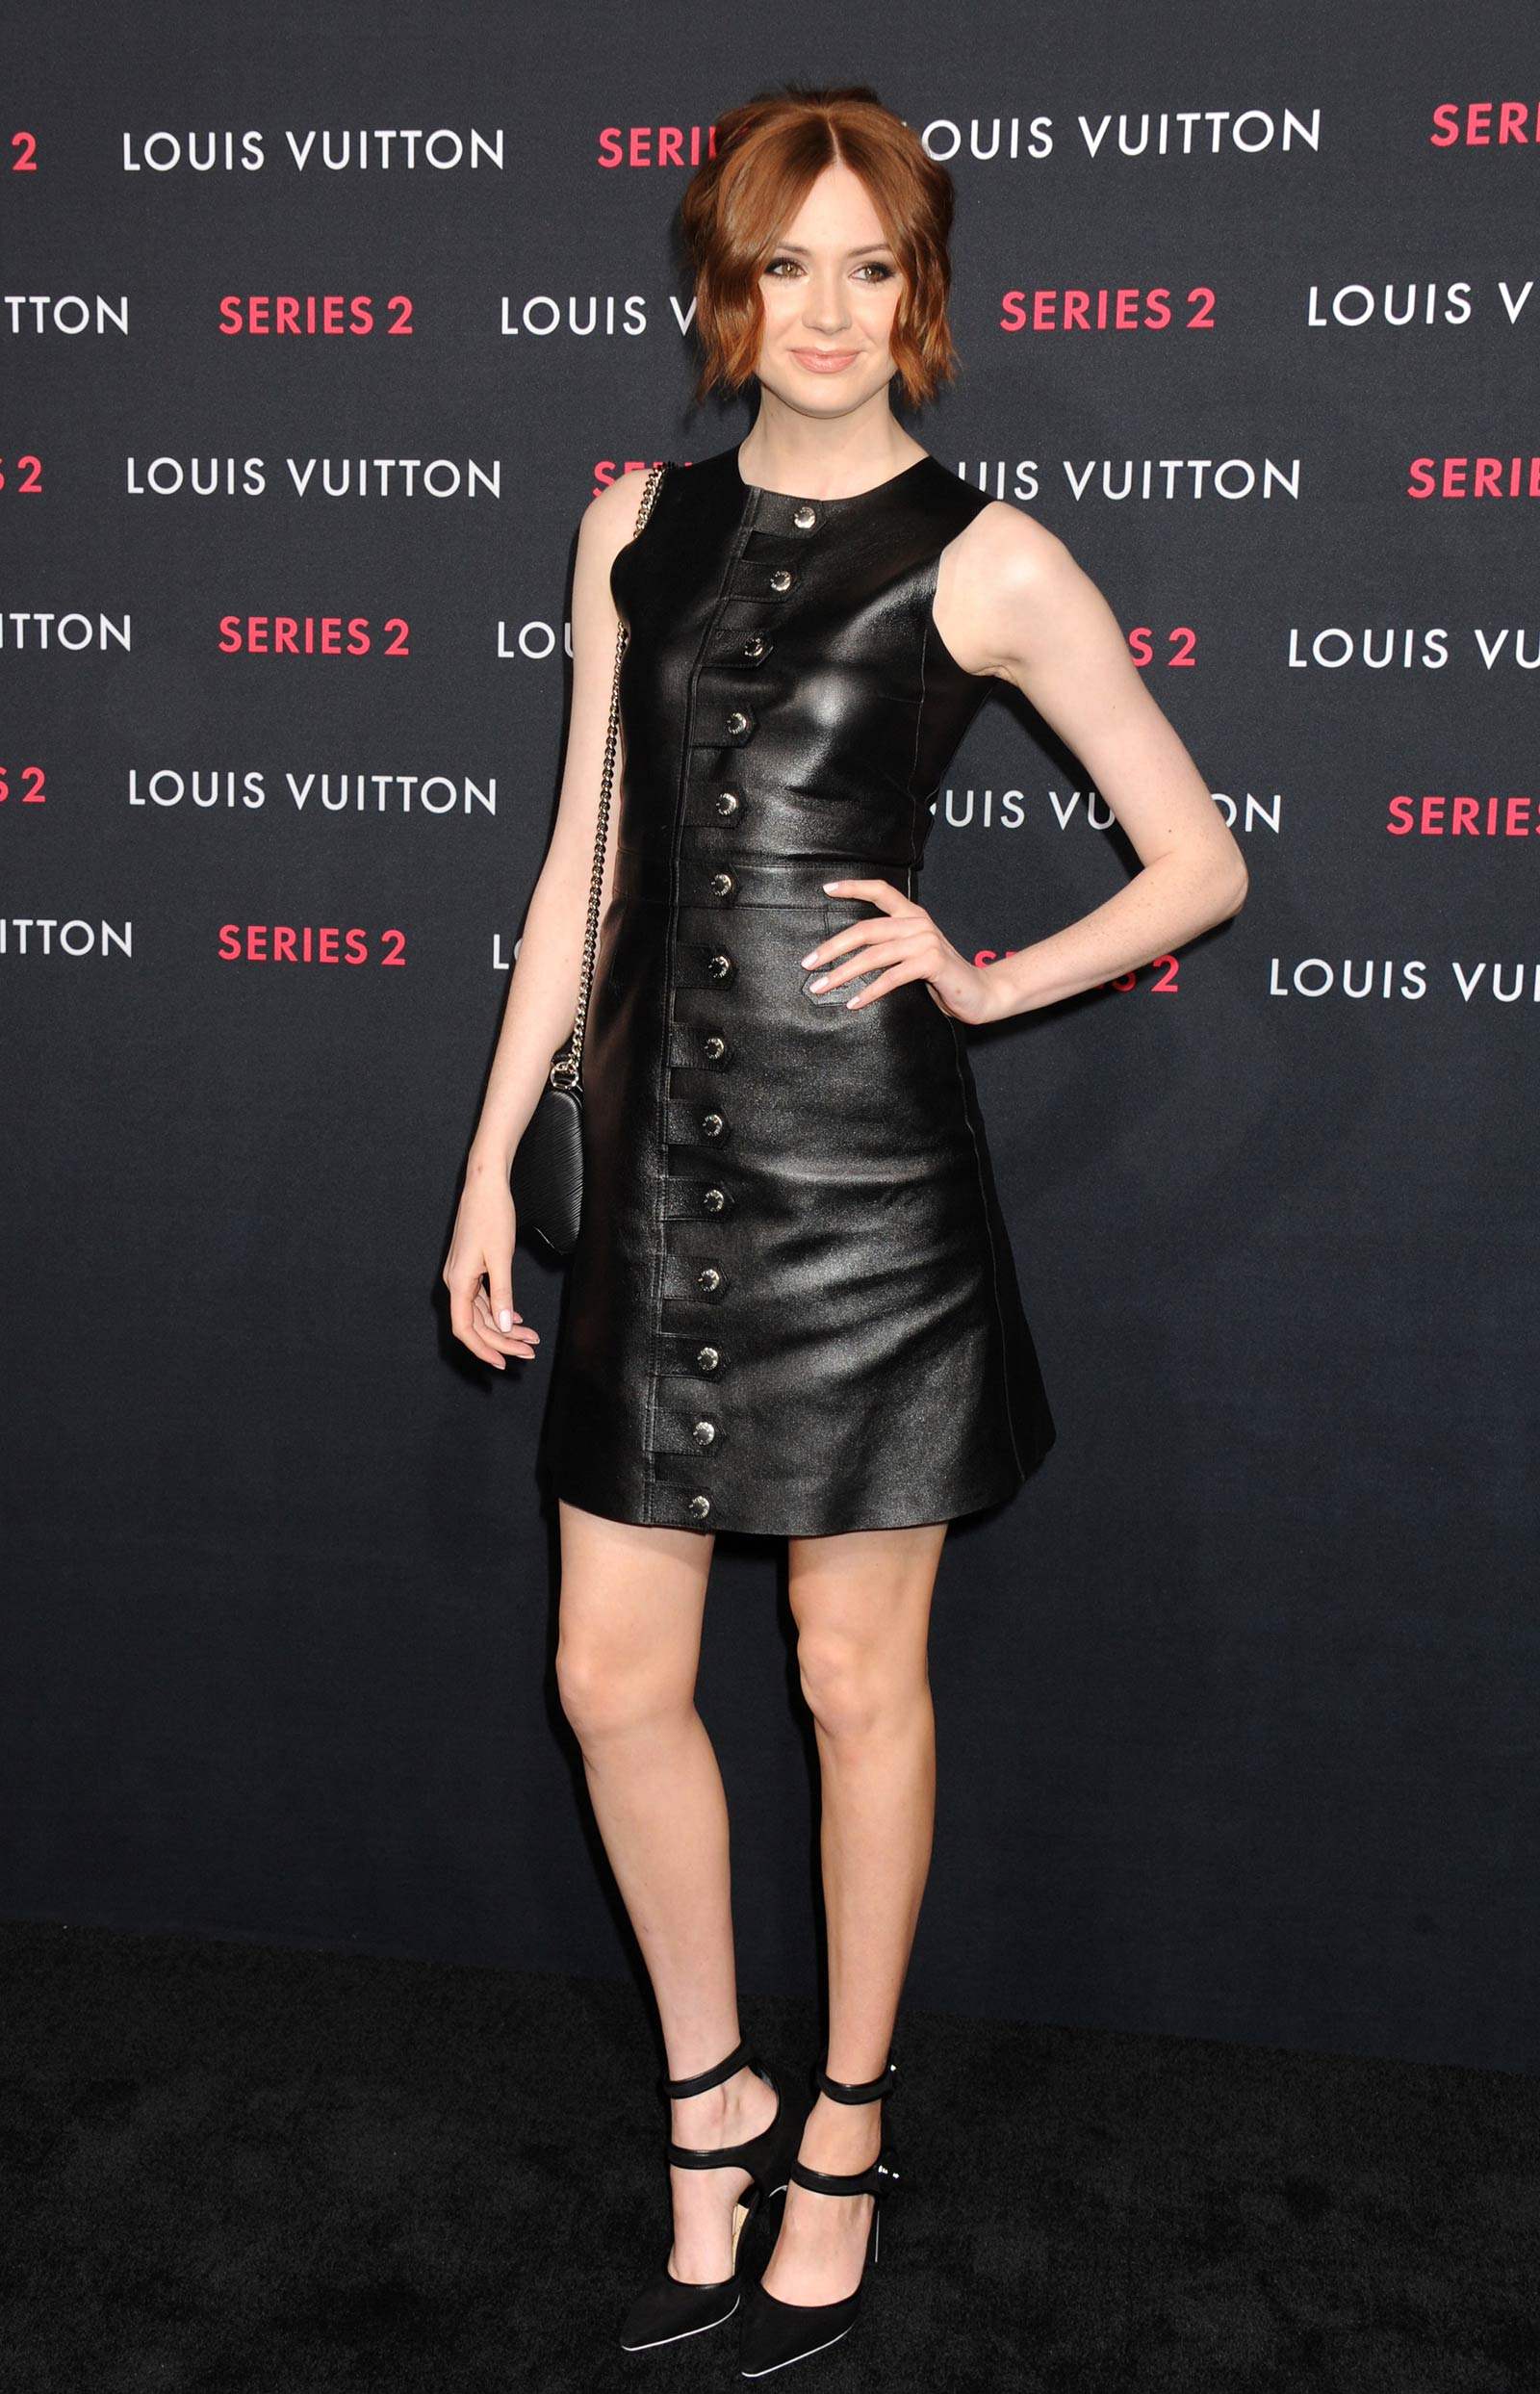 Karen Gillan attends Louis Vuitton Series 2 The Exhibition